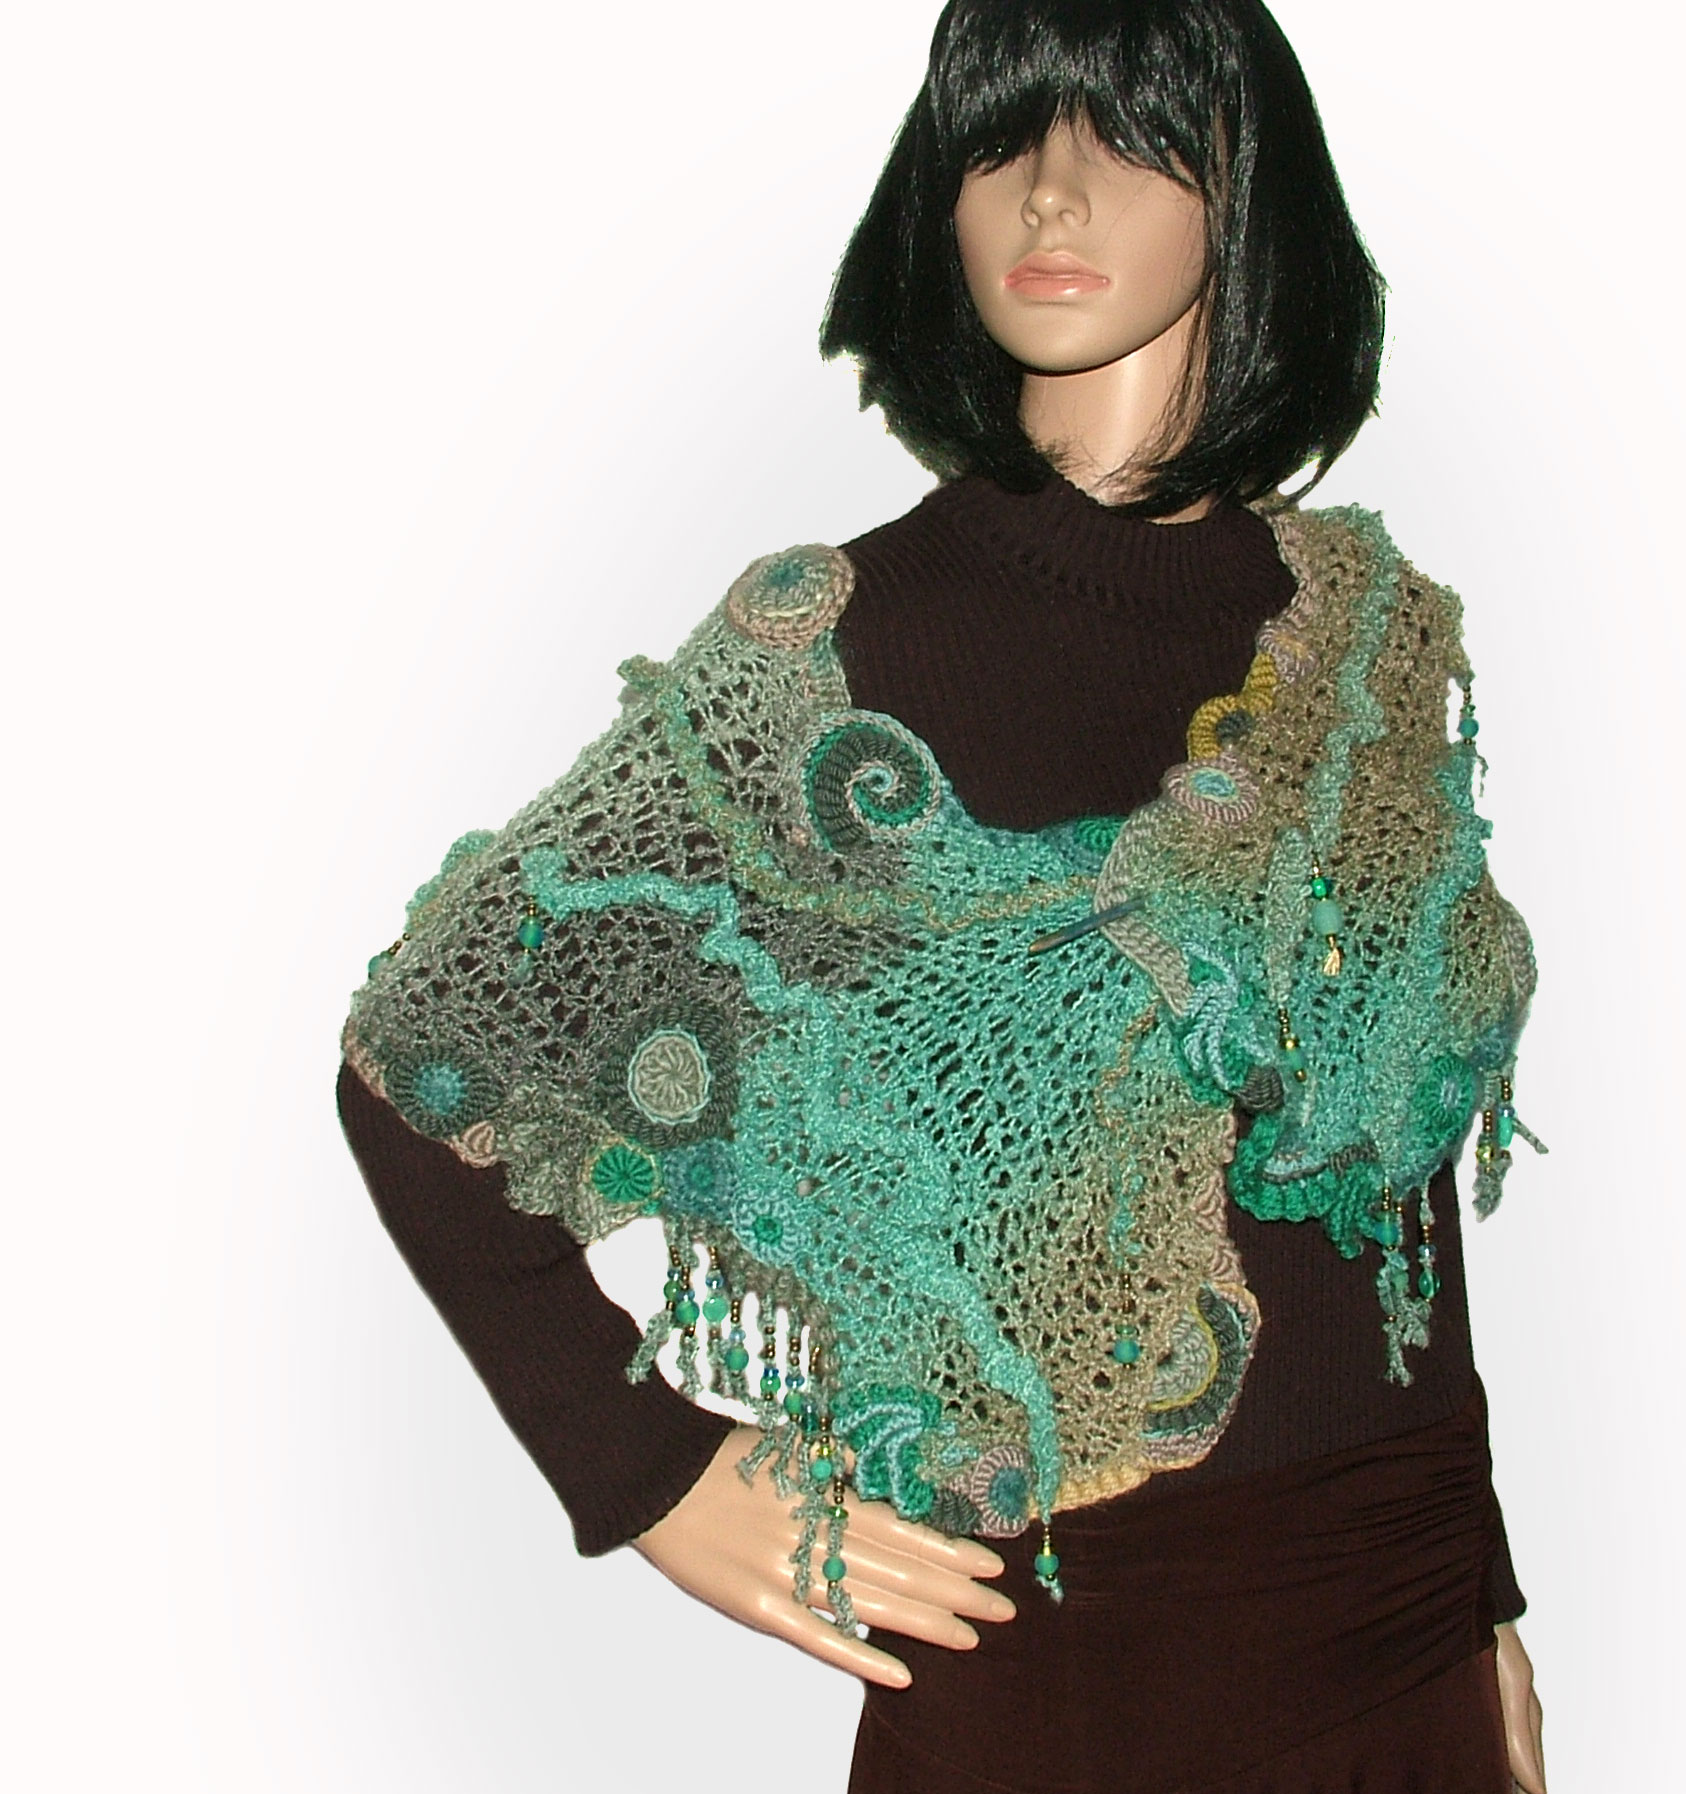 Freestyle Knit, Freeform Crochet scarf, shawl, wrap Renate Kirkpatrick...